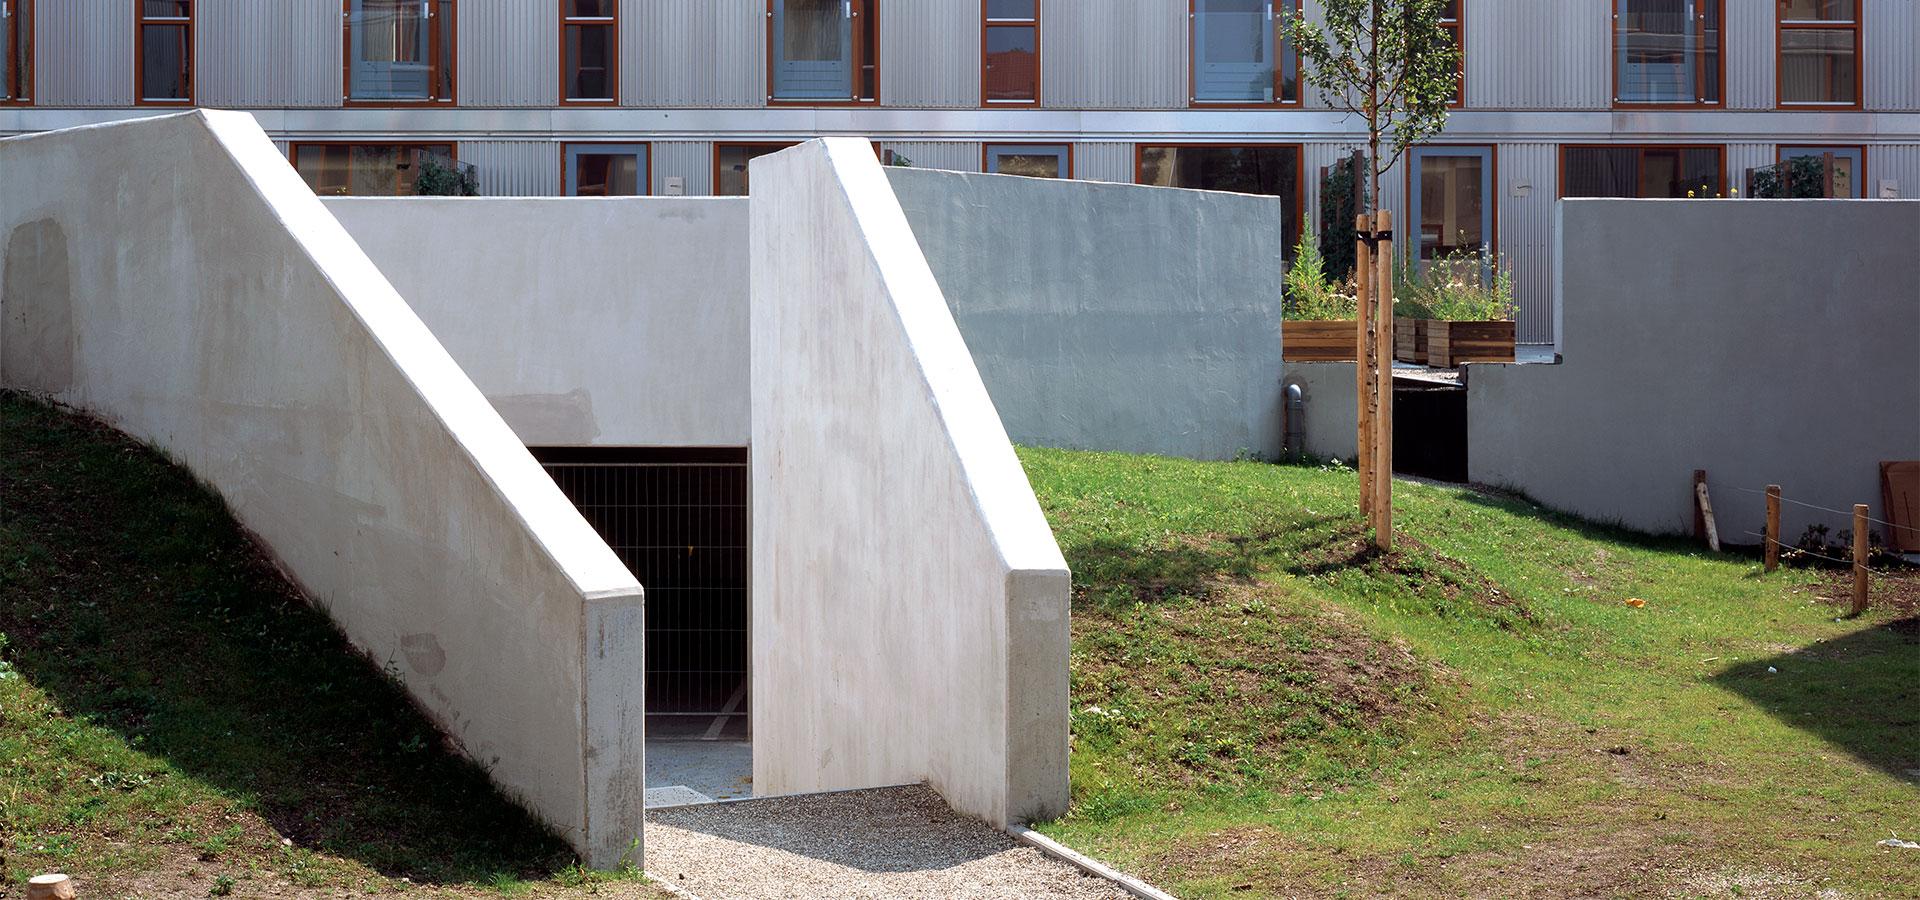 FARO architecten Geuzentuinen Amsterdam 10